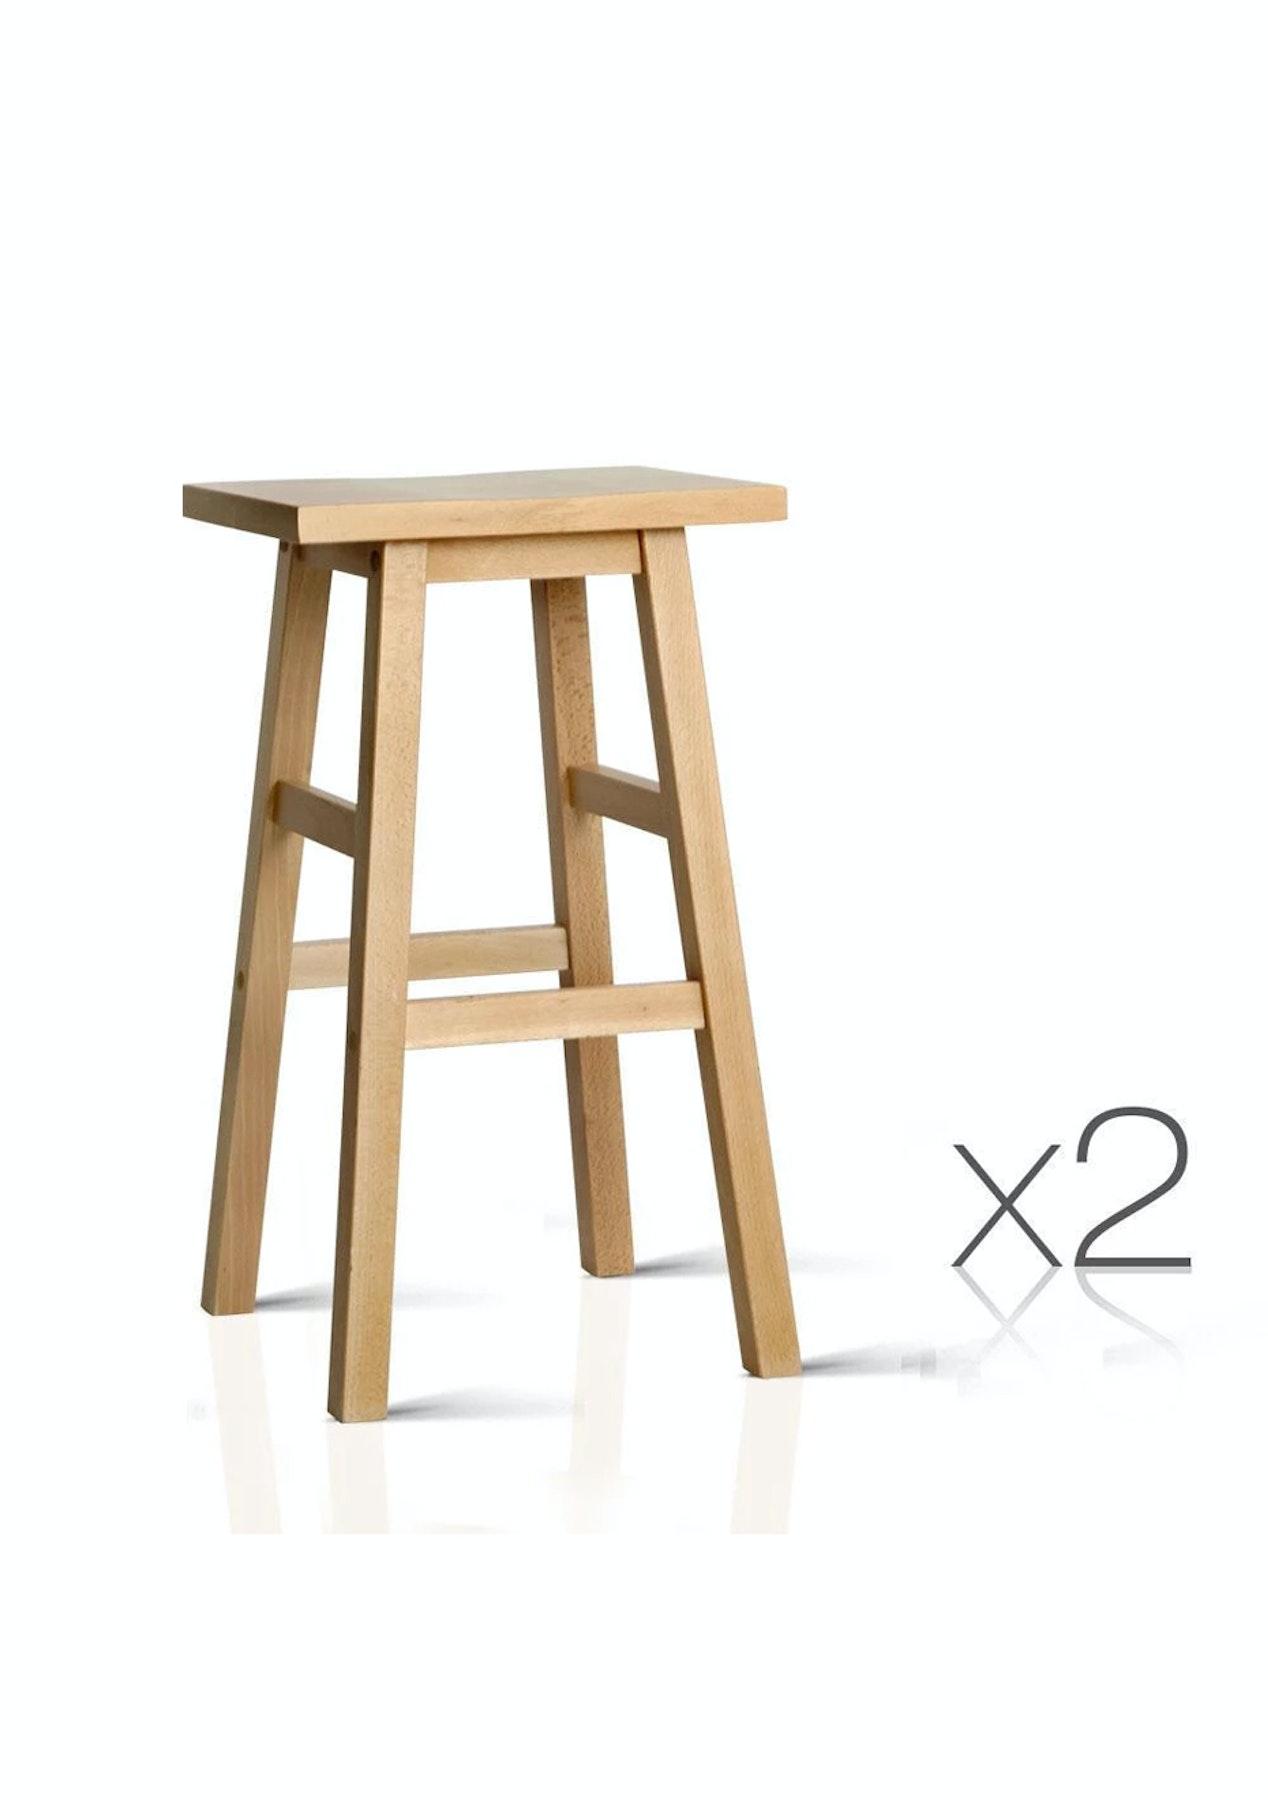 Terrific Artiss Set Of 2 Wooden Backless Bar Stools Natural Inzonedesignstudio Interior Chair Design Inzonedesignstudiocom